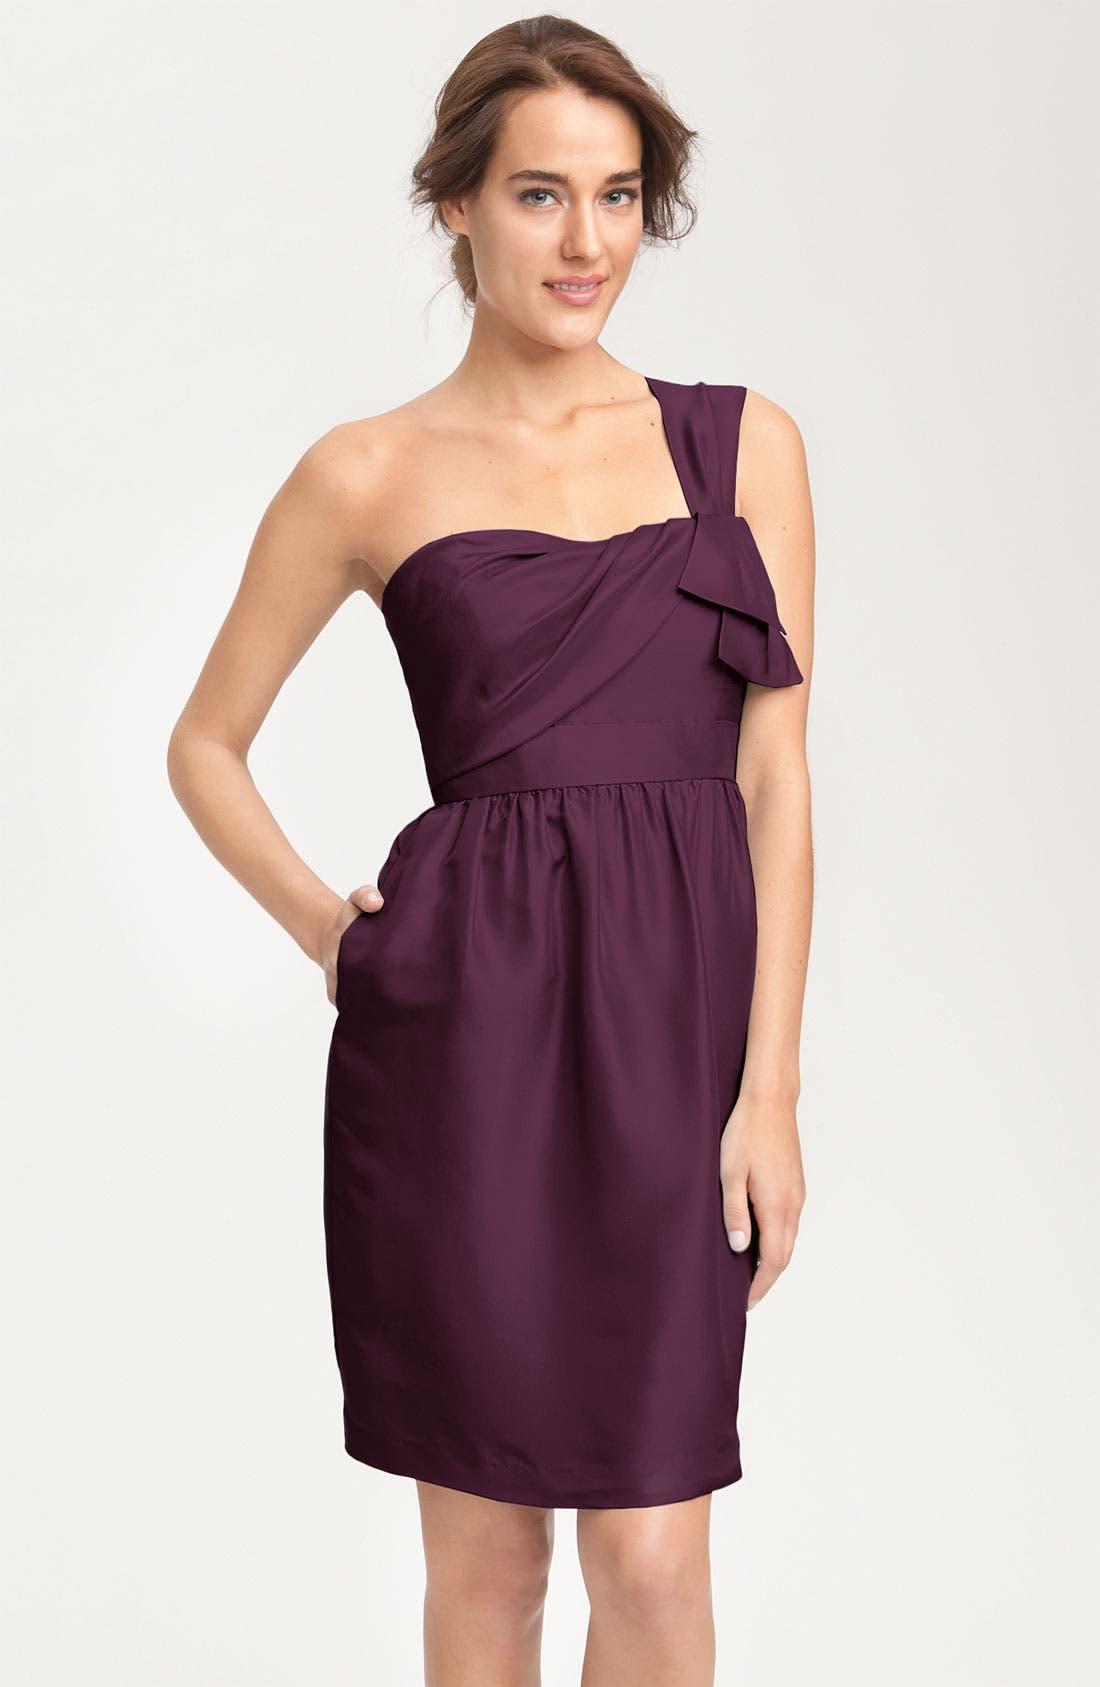 Alternate Image 1 Selected - Jenny Yoo Convertible Shantung Dress